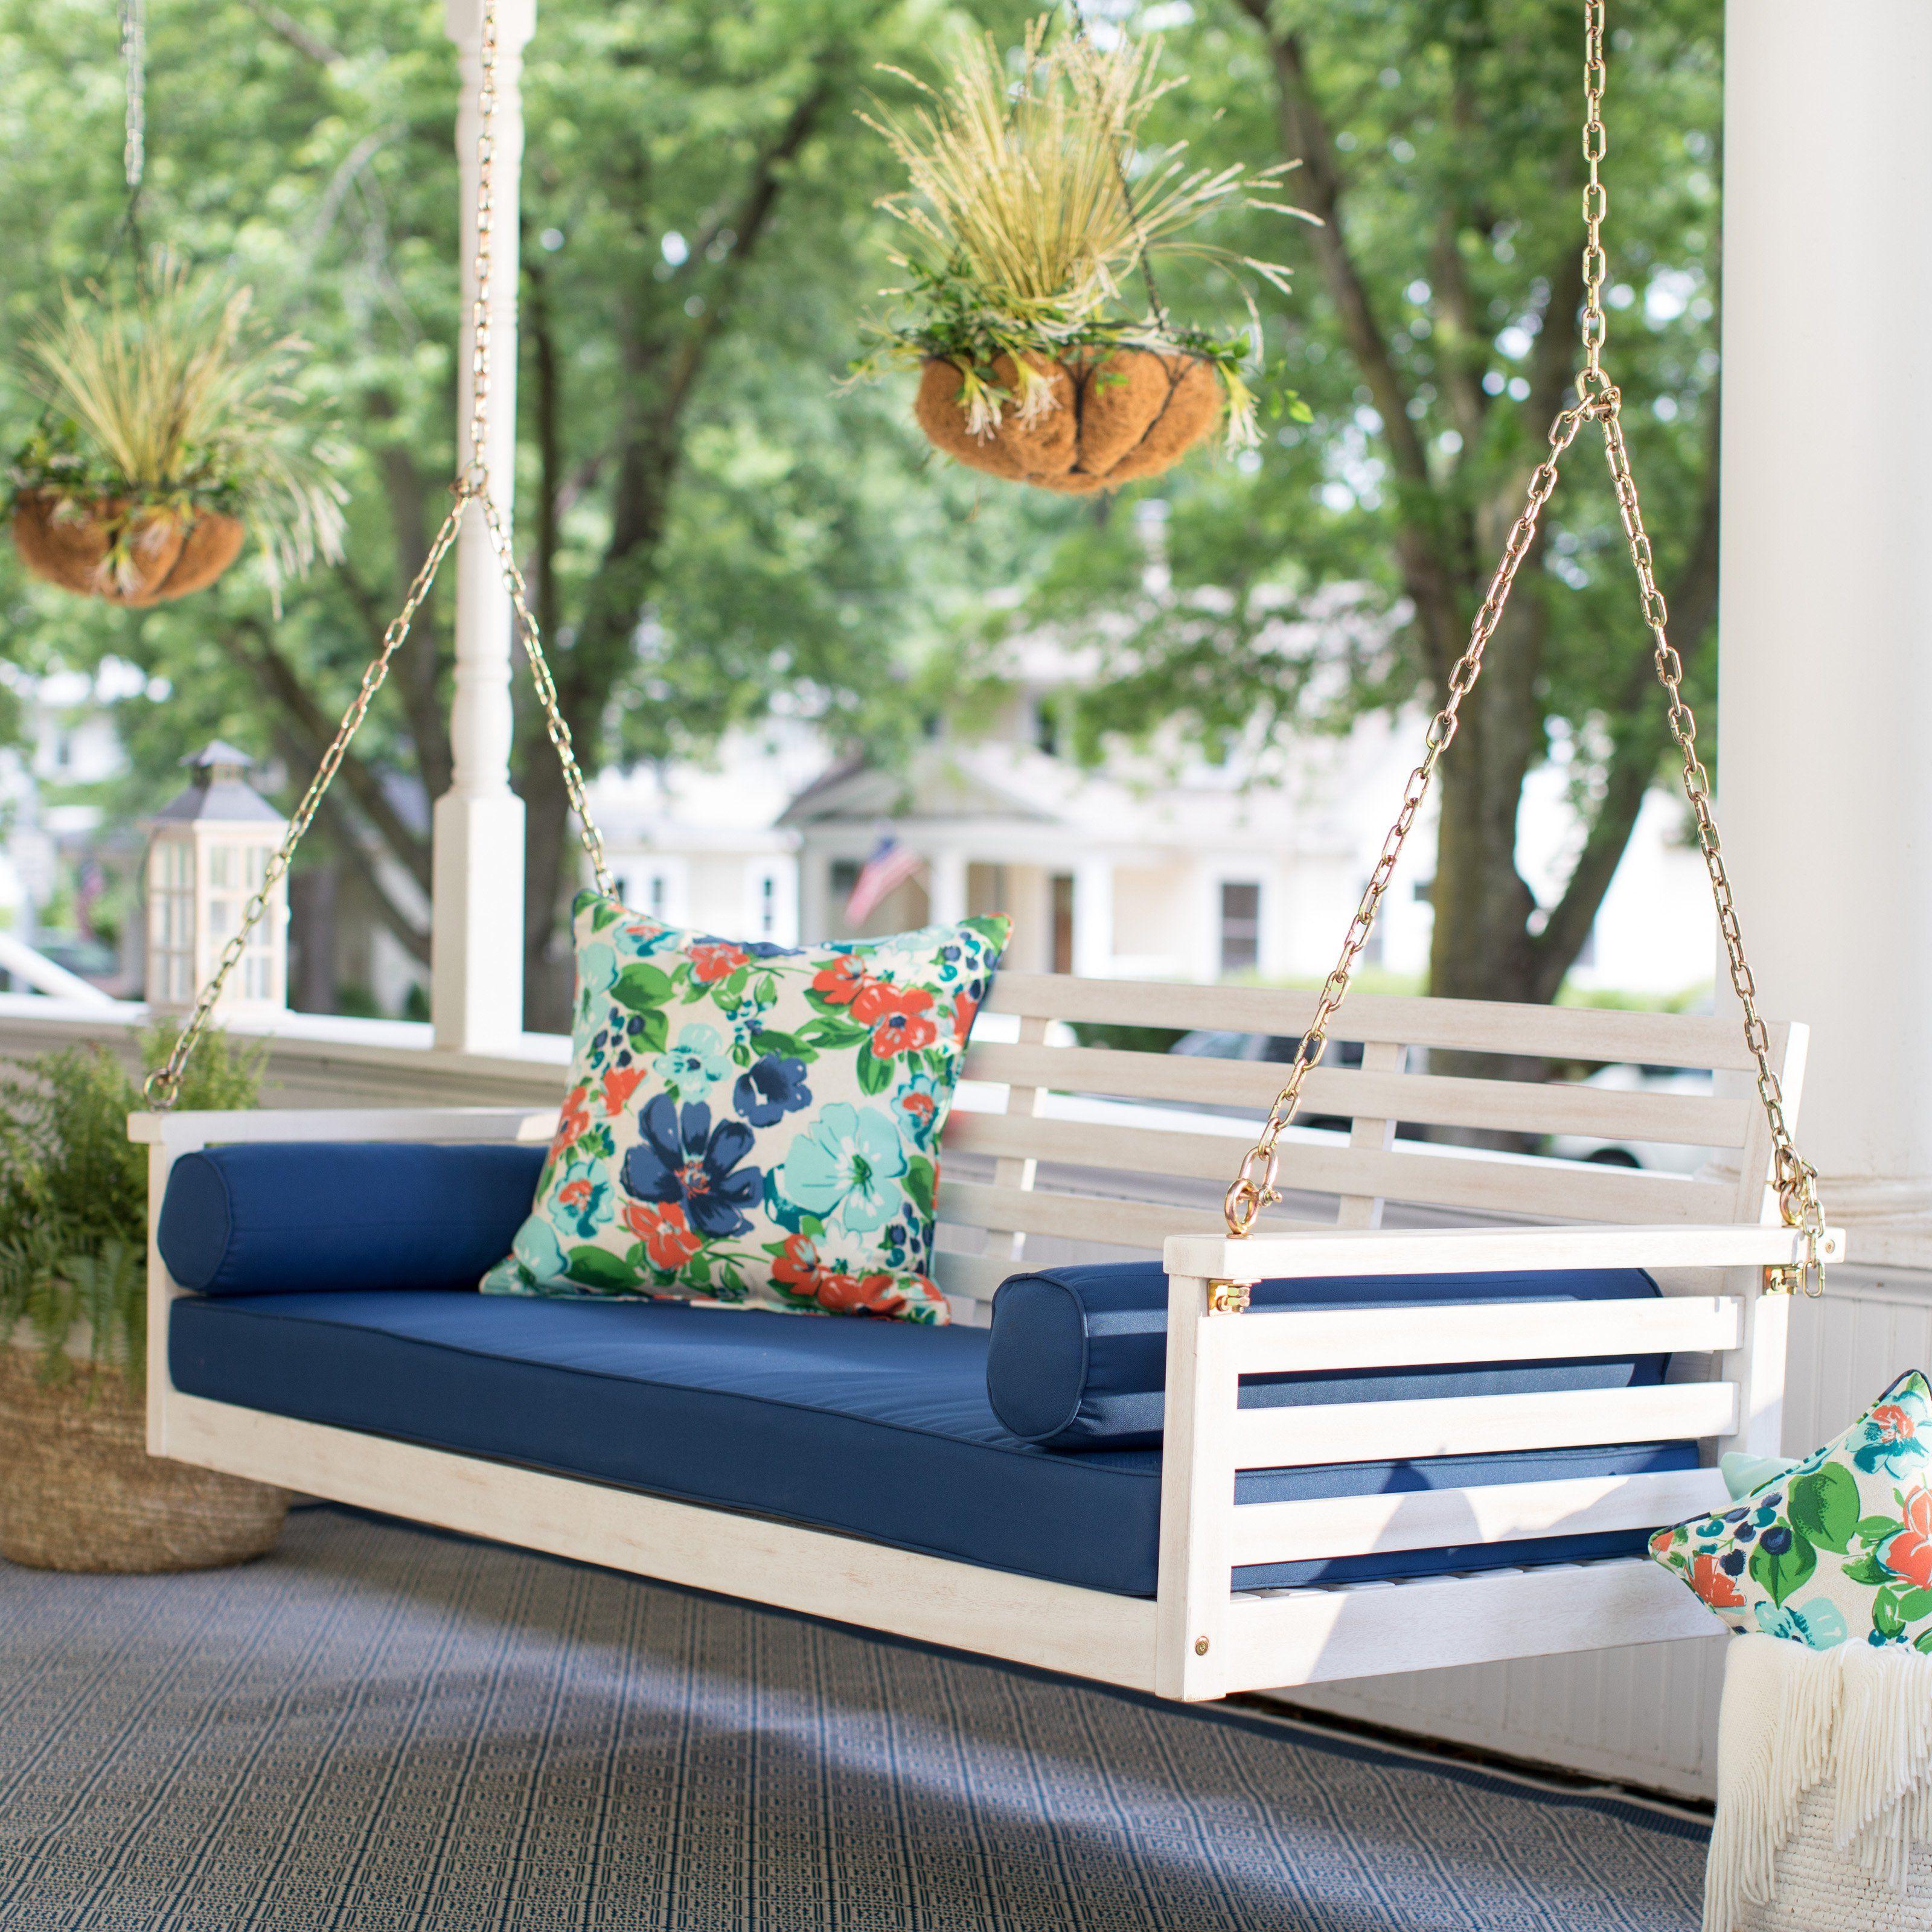 Belham living brighton beach deep seating porch swing bed